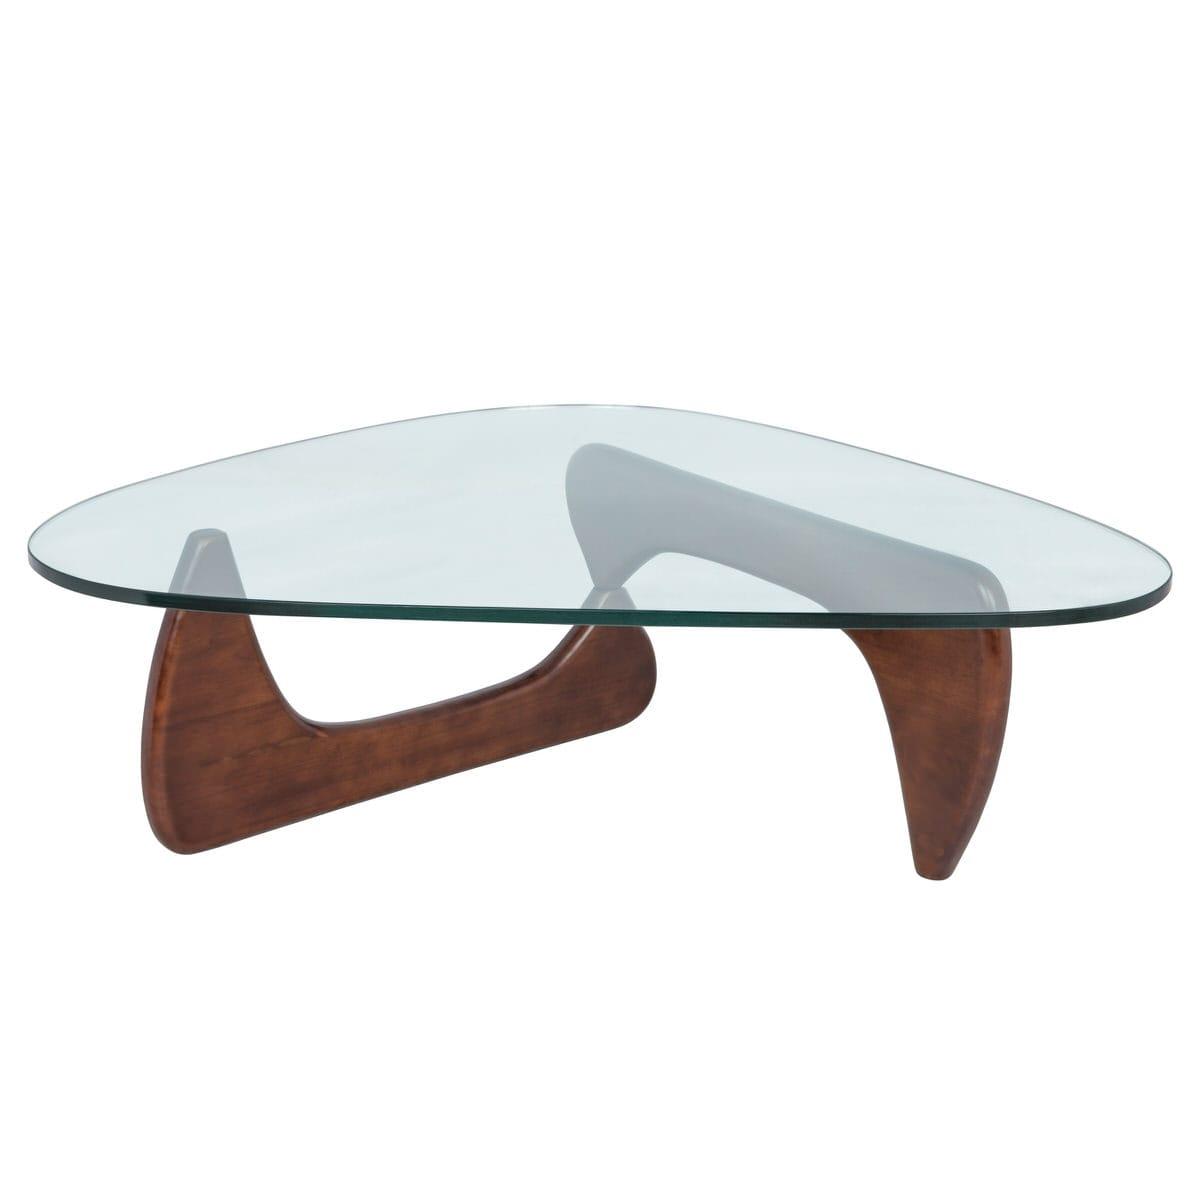 - Imperial Triangle Dark Walnut Coffee Table By LeisureMod